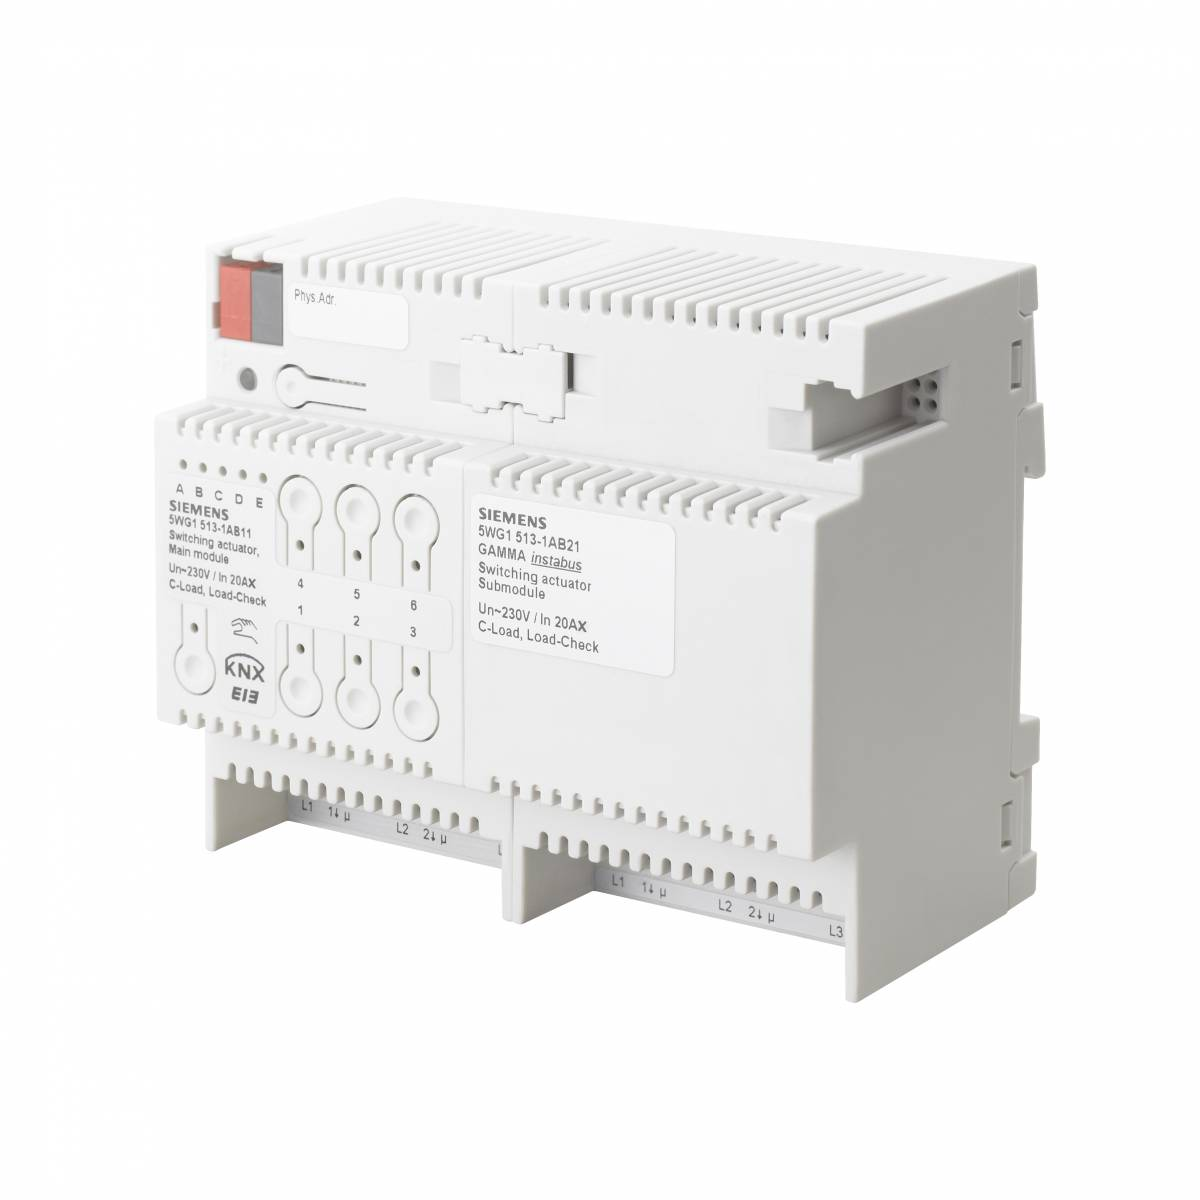 Switch actuator submodule' 3 x AC 230/400 V' 20 AX